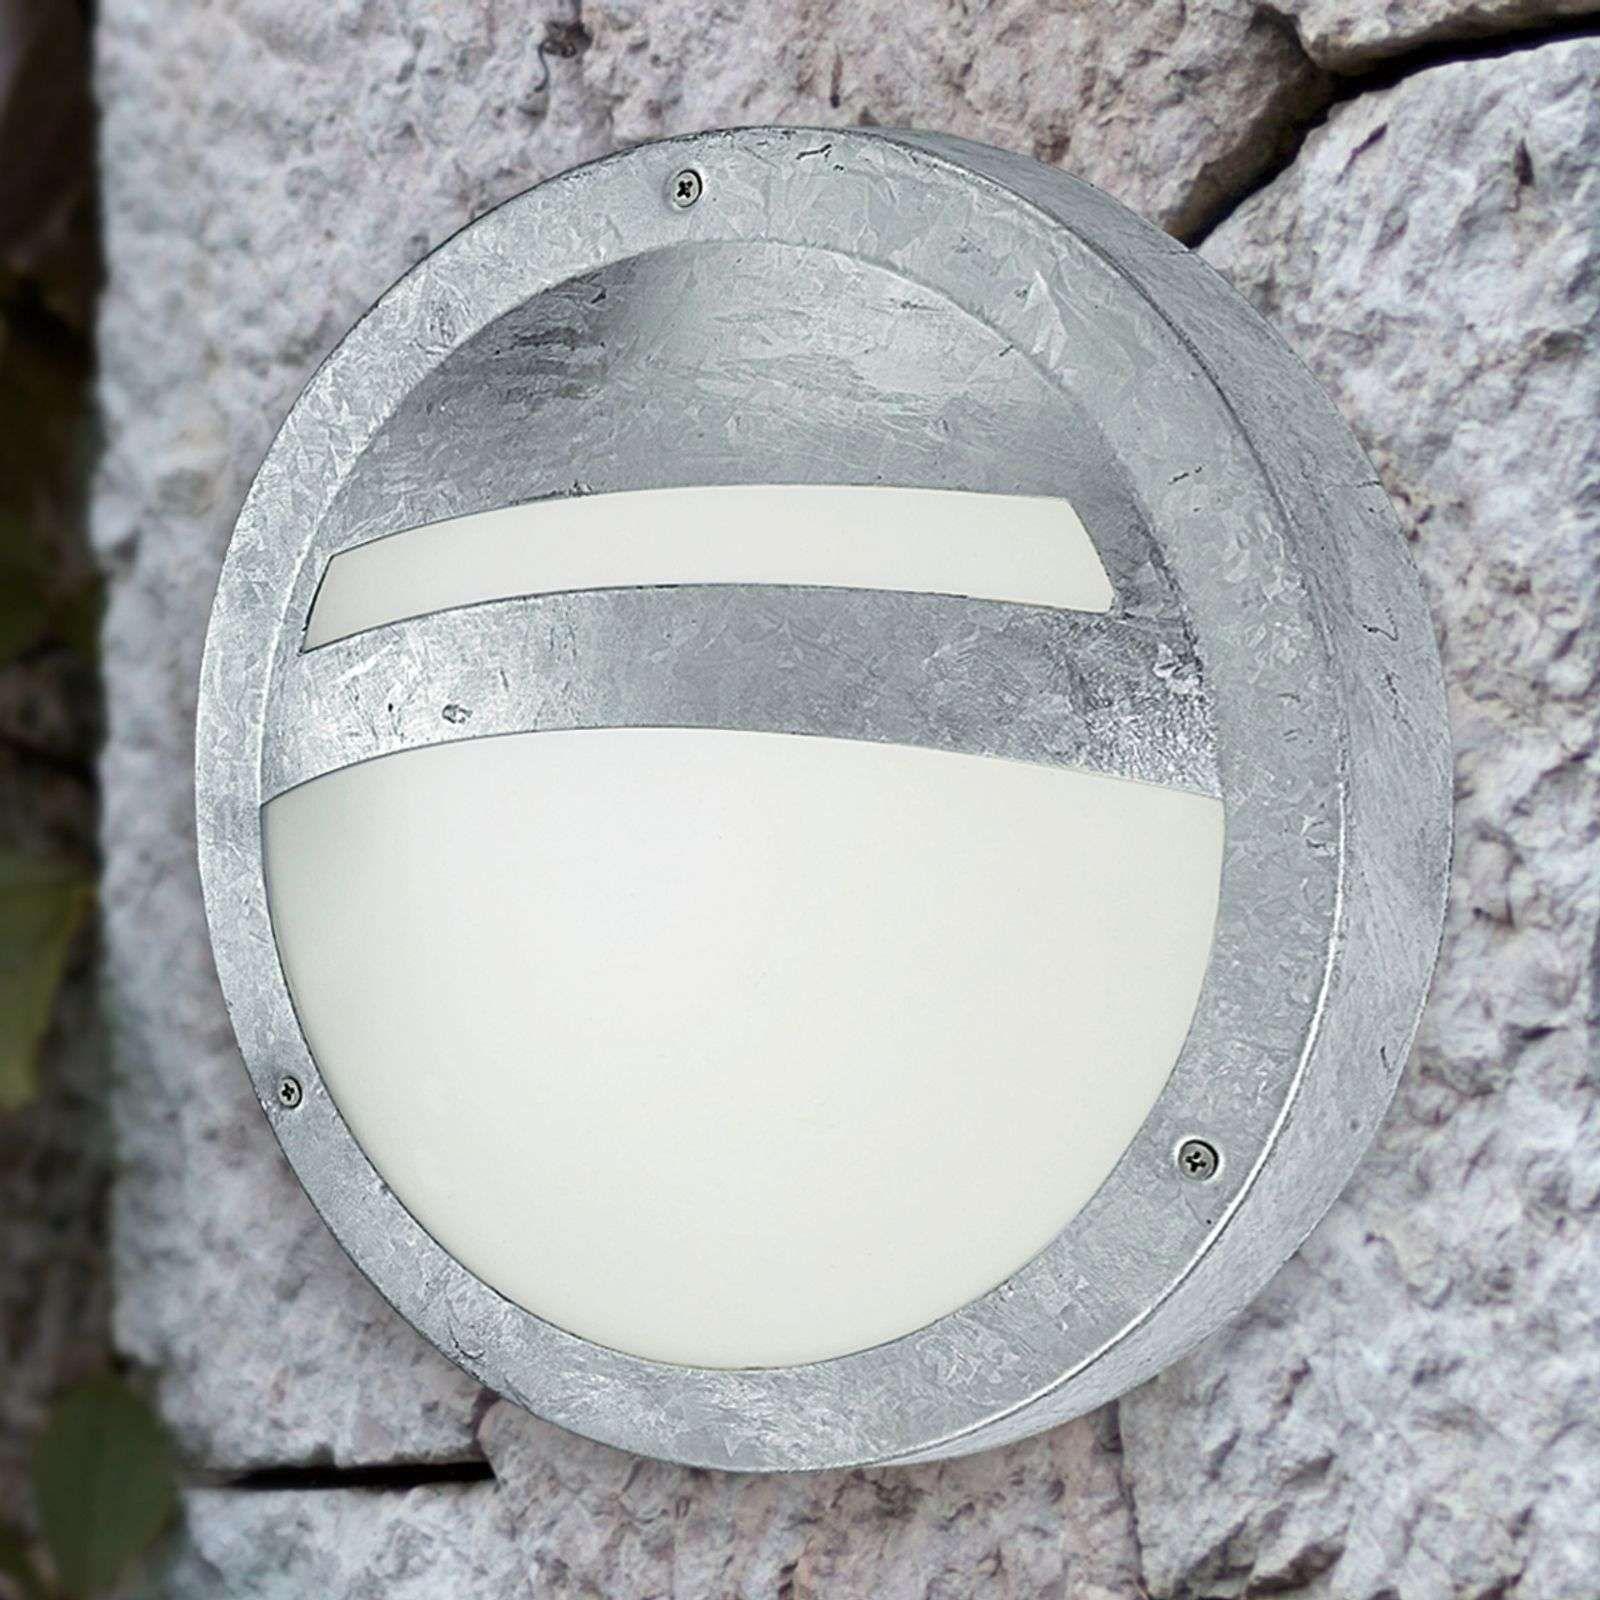 Wandlamp Slaapkamer Leenbakker Wandlamp Kinderkamer Zonder Snoer Kinderkamer Wandlamp Buitenwandlamp Met Sensor En Camera Led Wand In 2020 Sevilla Staal Lampen